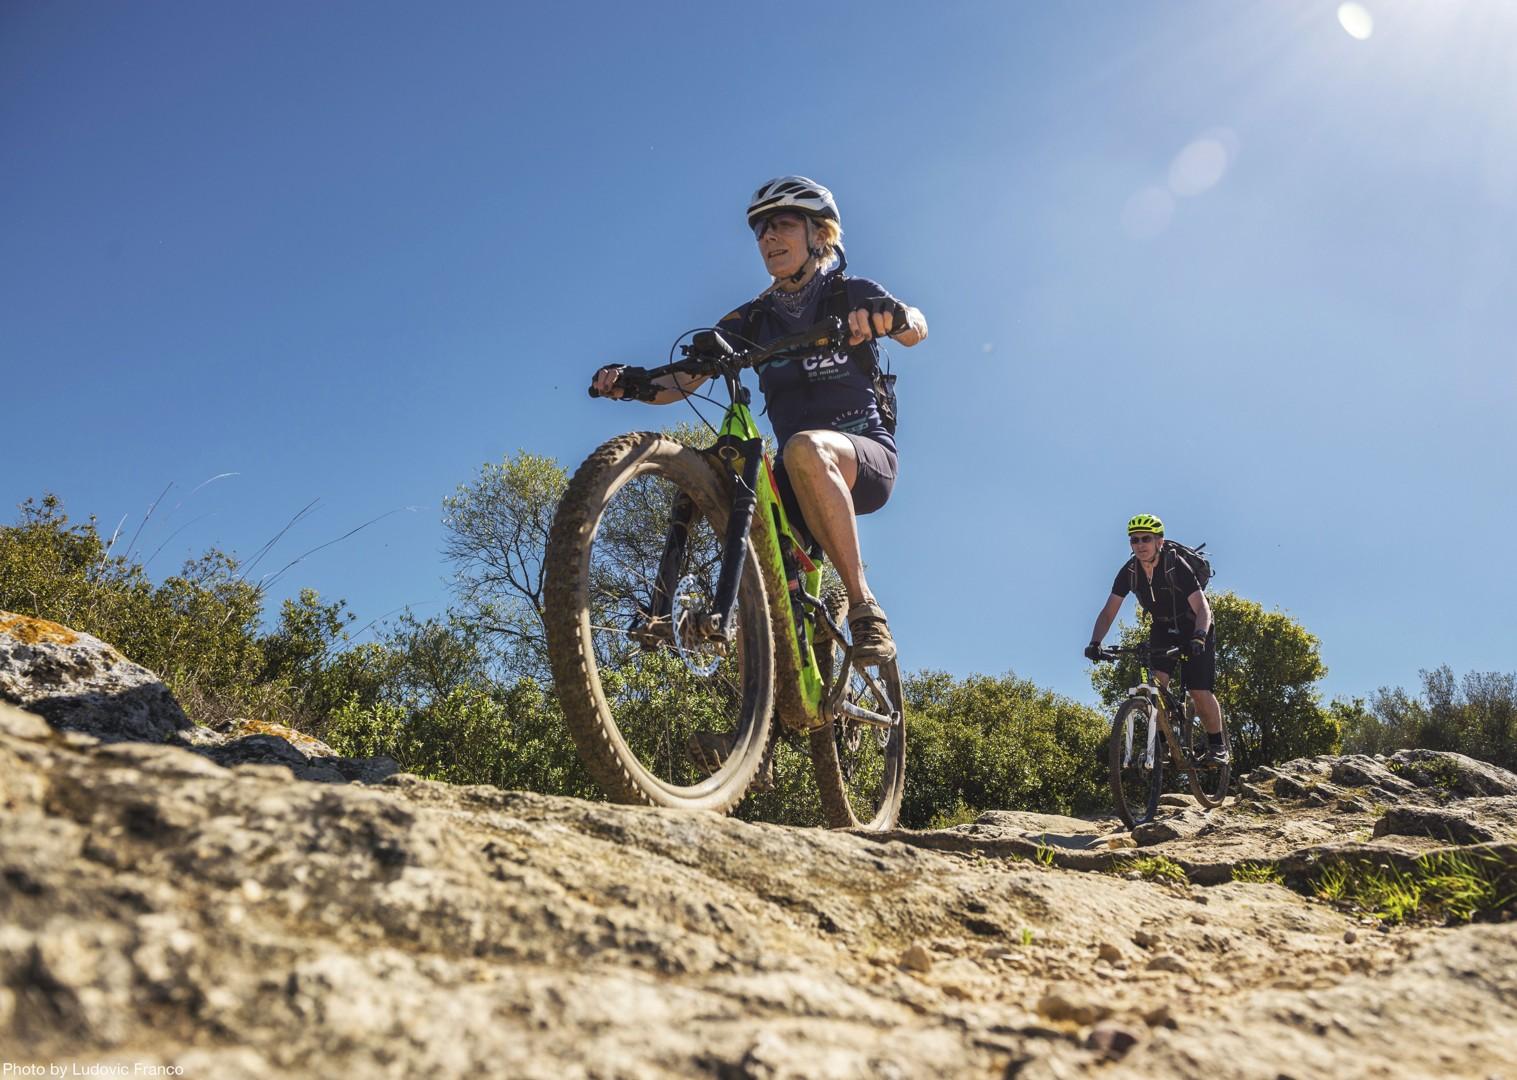 explore-mountain-biking-trip-atlantic-trails-portugal.jpg - Portugal - Atlantic Trails - Guided Mountain Bike Holiday - Mountain Biking